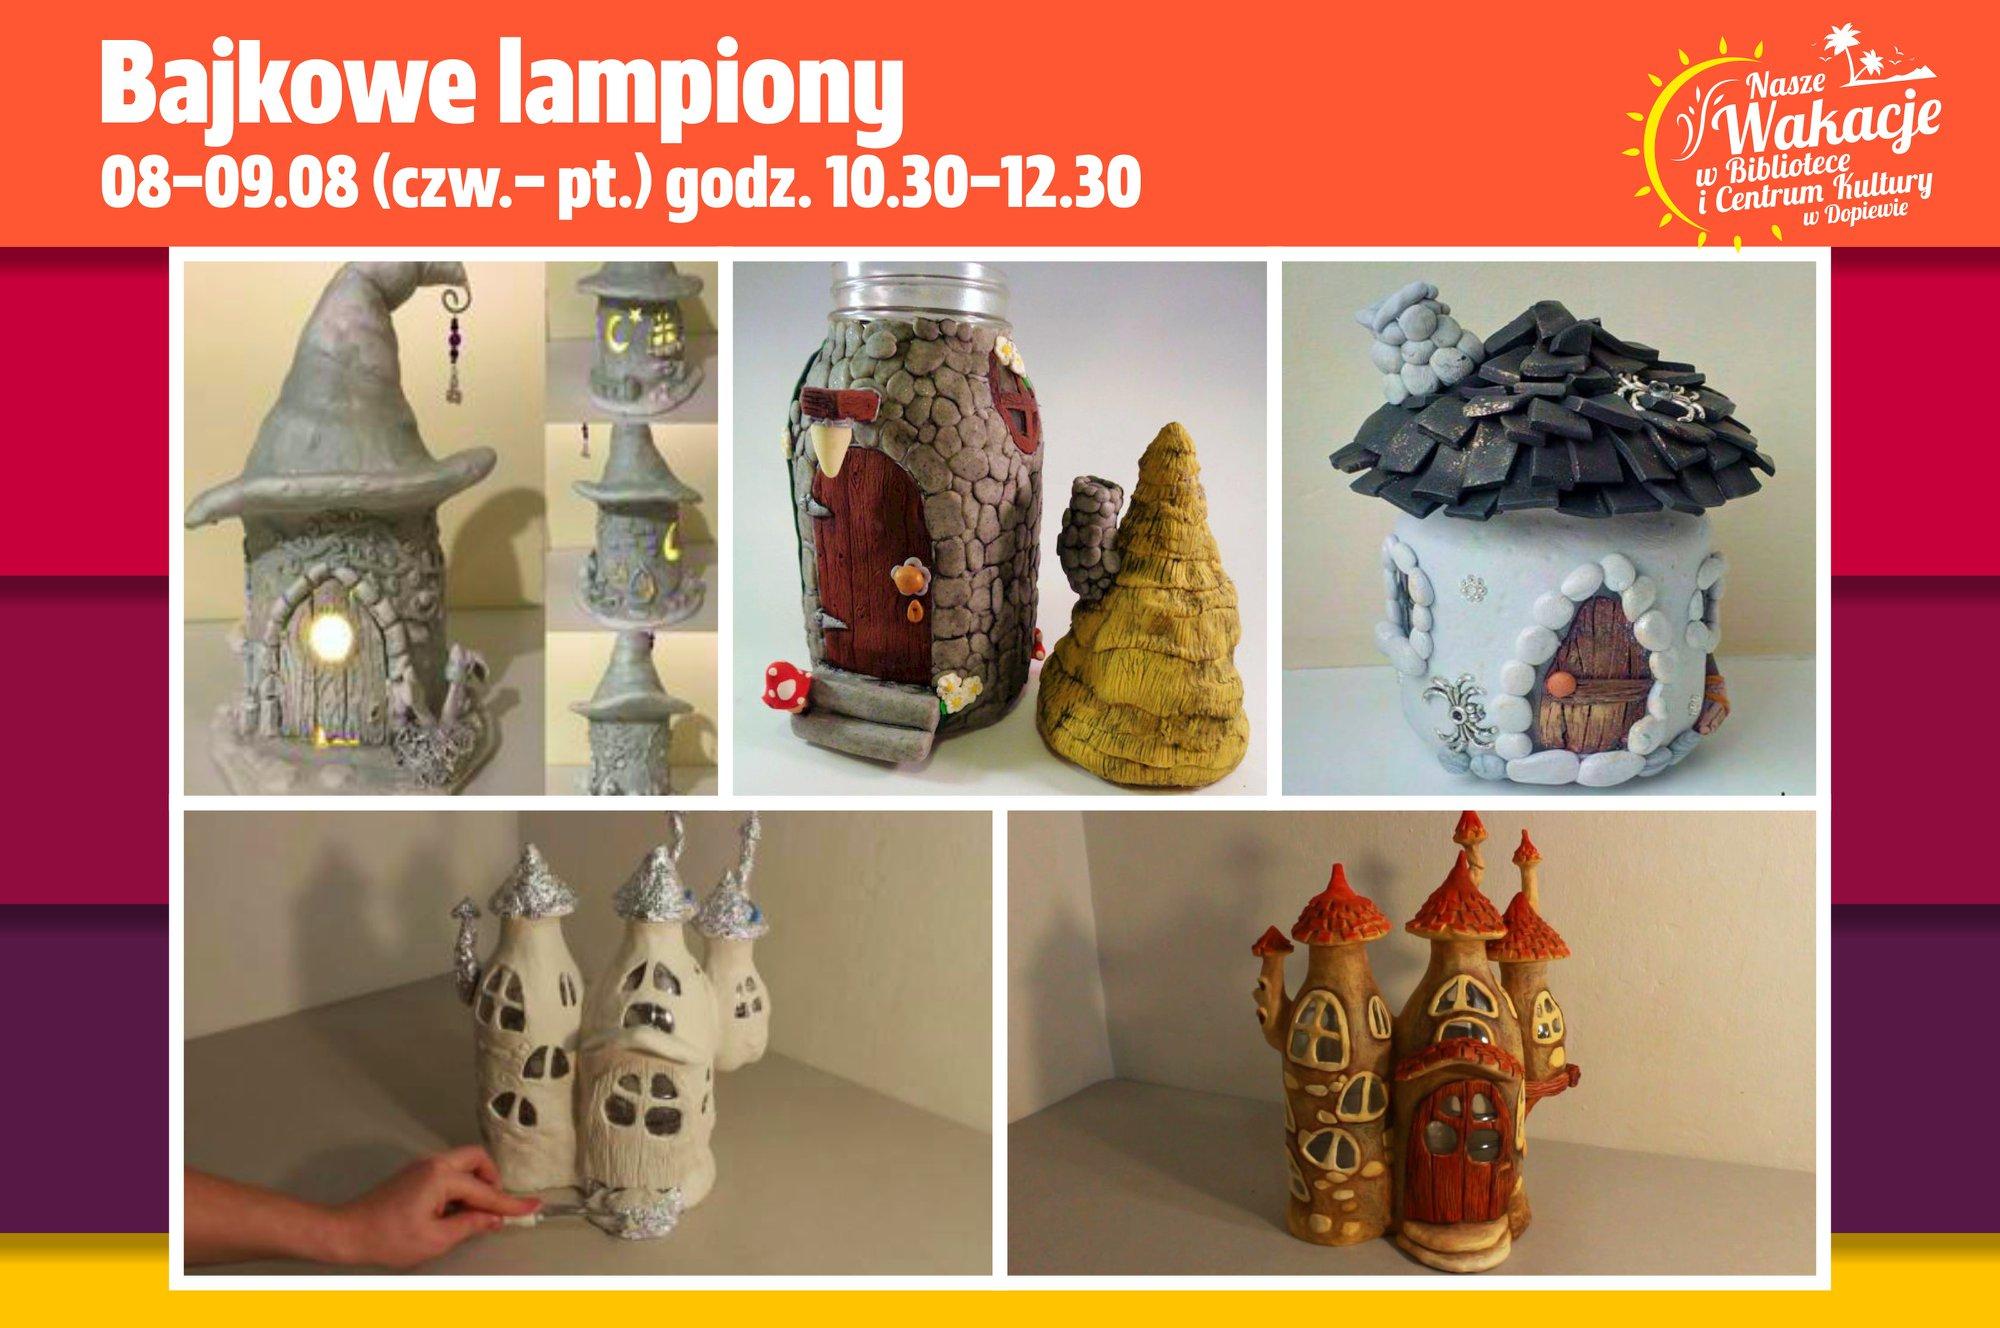 Bajkowe Lampiony